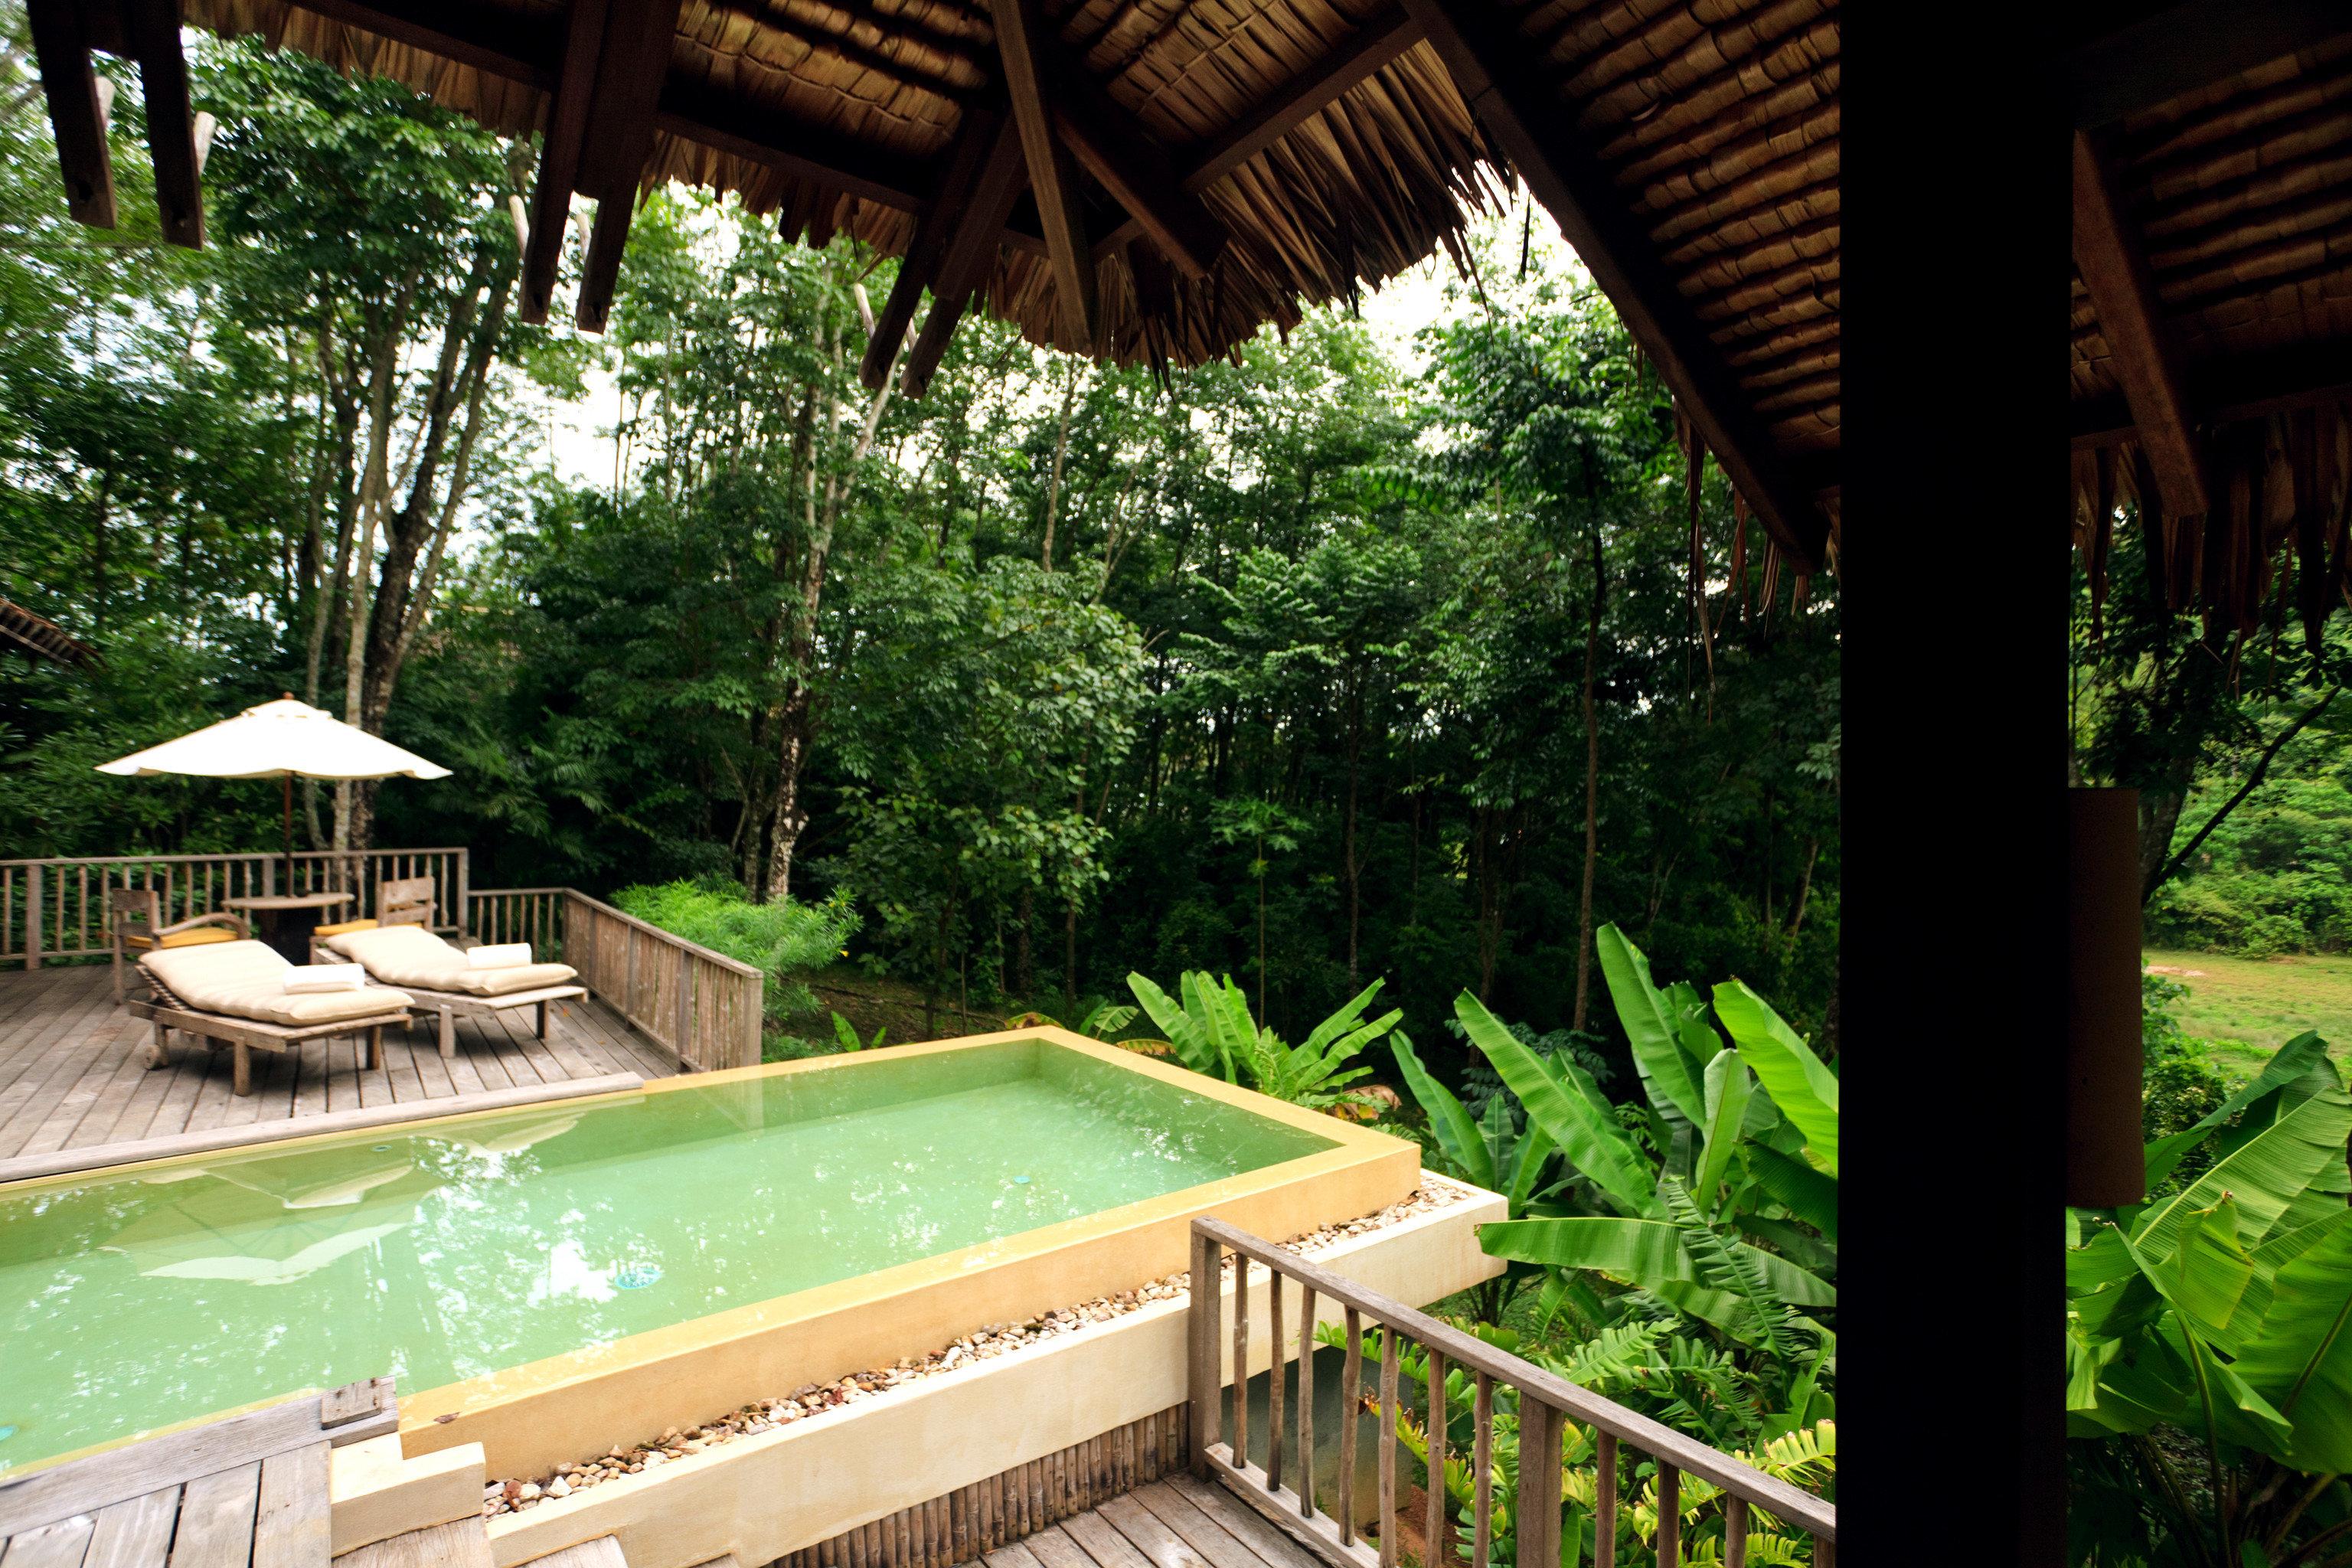 Beach Beachfront Hotels Luxury Modern Ocean Phuket Pool Thailand Villa tree outdoor green swimming pool Resort backyard estate Jungle eco hotel Garden outdoor structure cottage wood